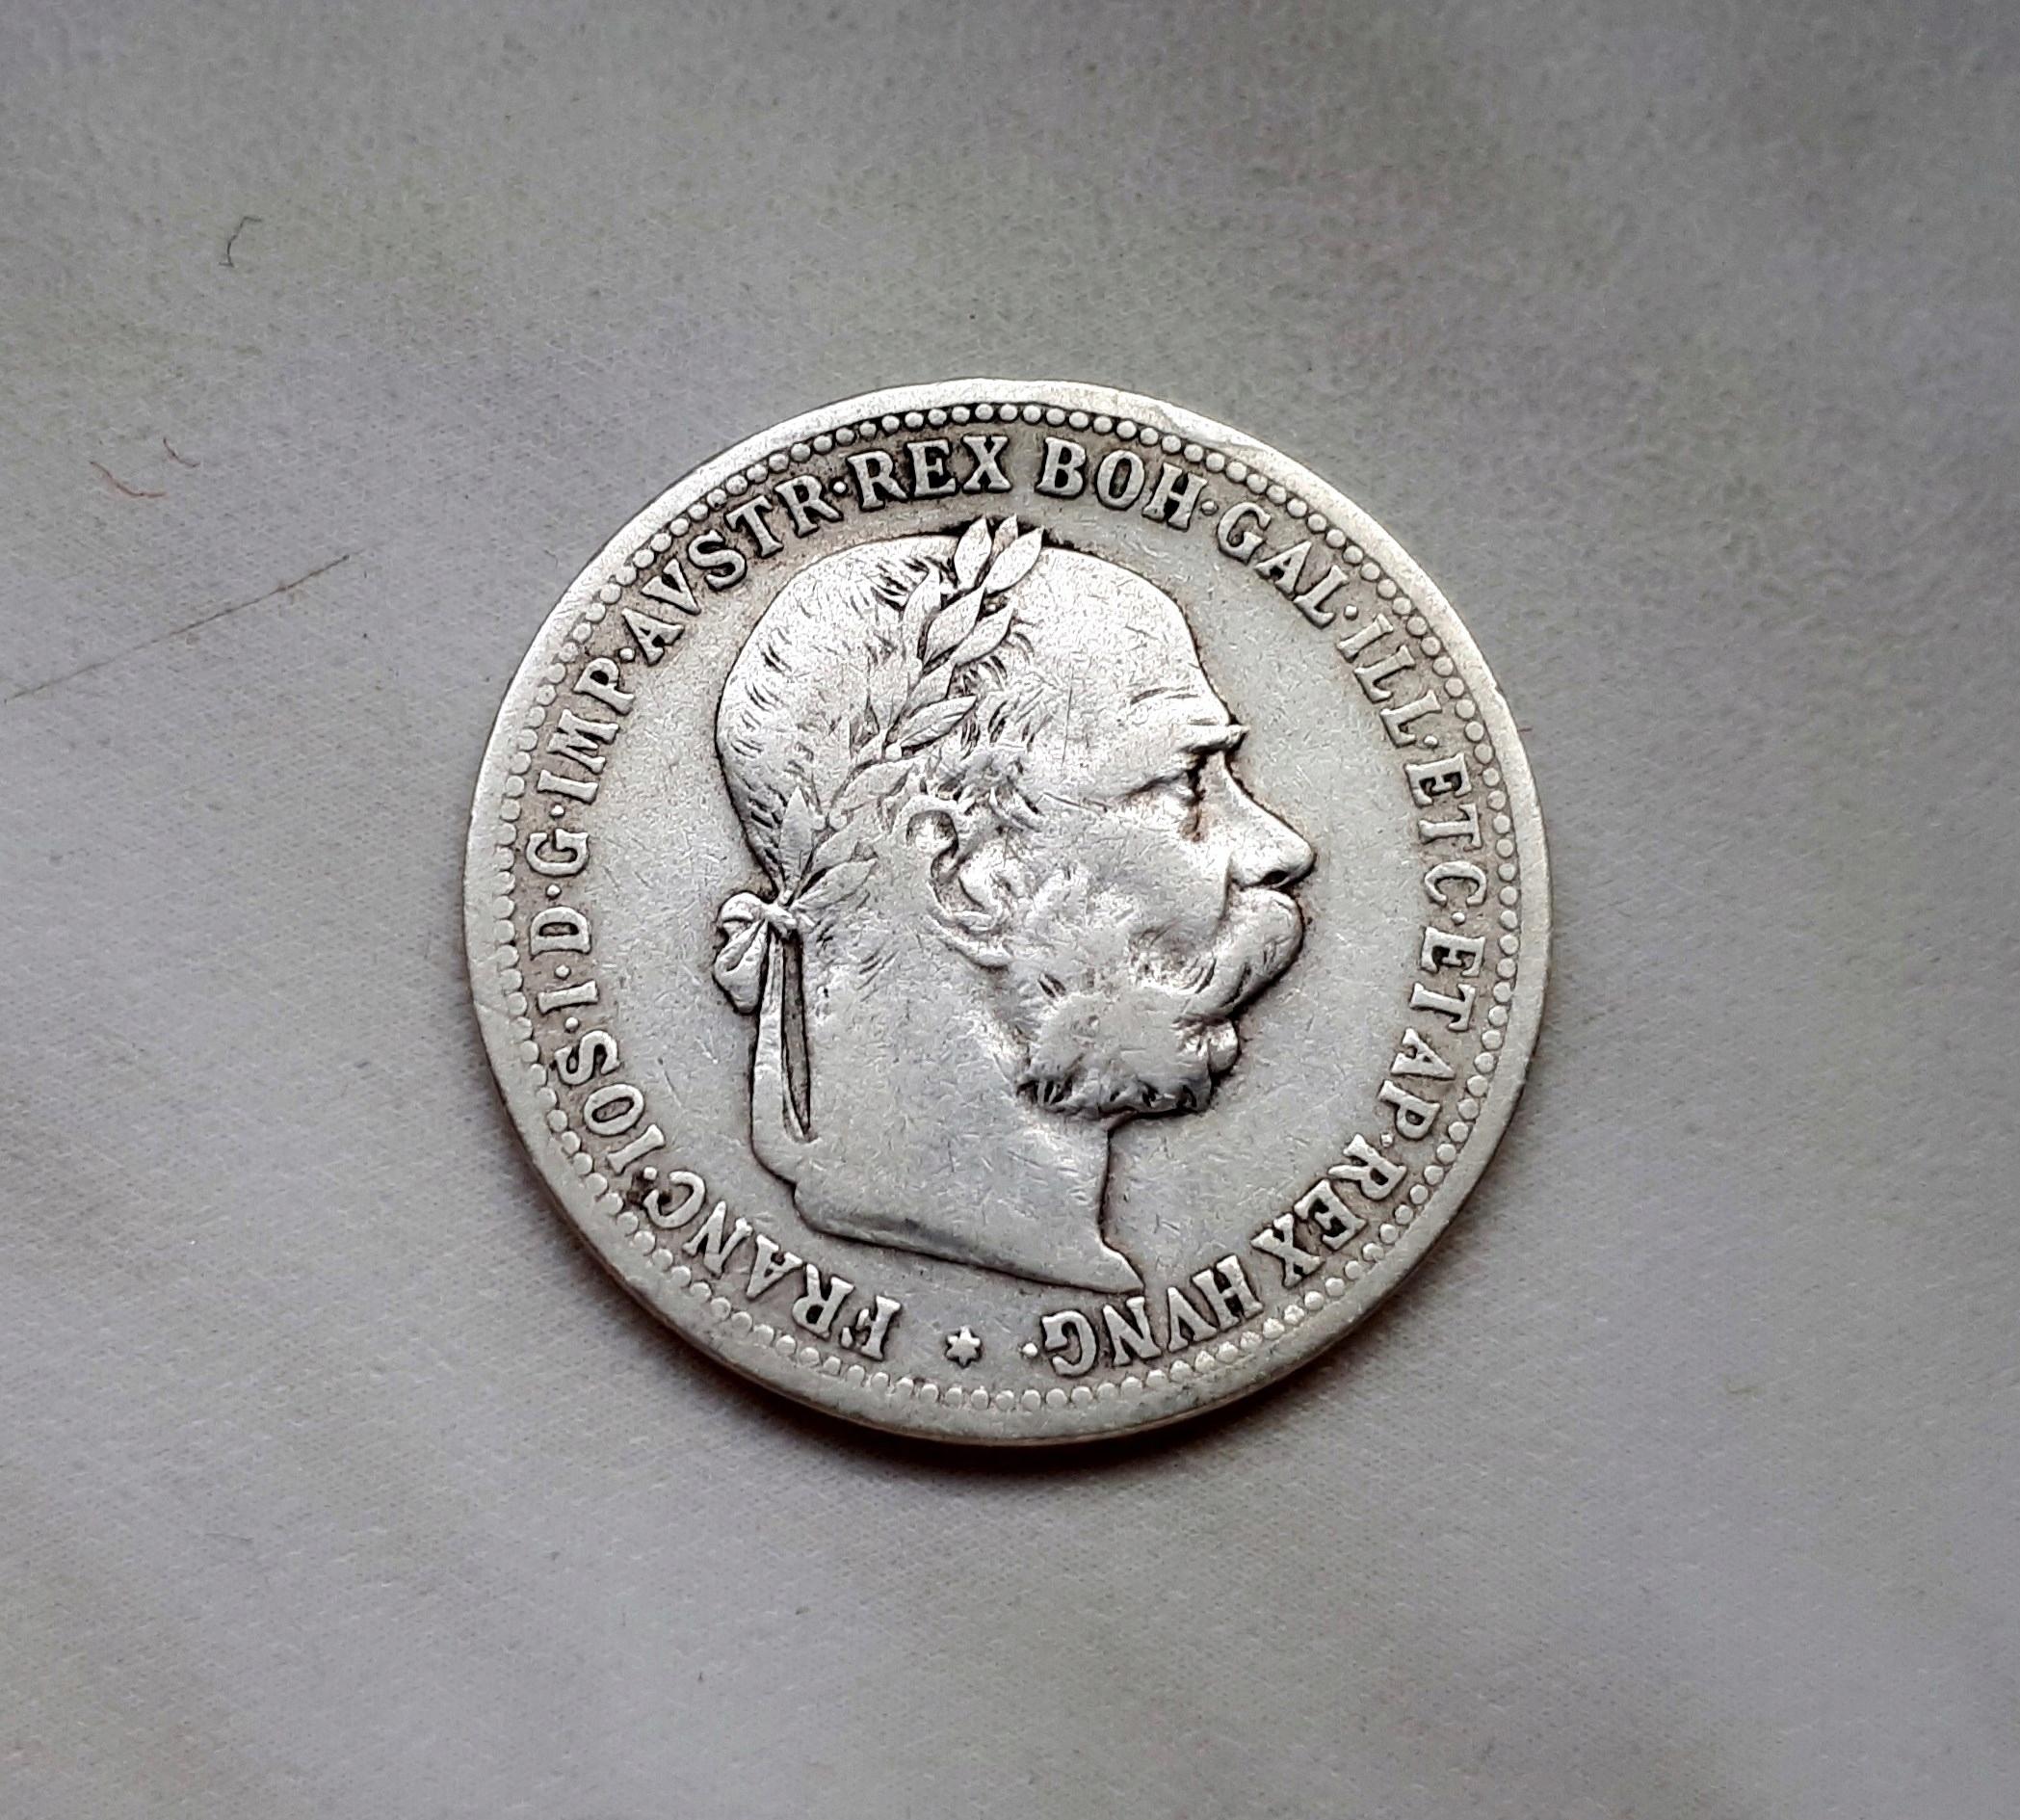 46) AUSTRIA srebro - 1 Korona - 1901 r.